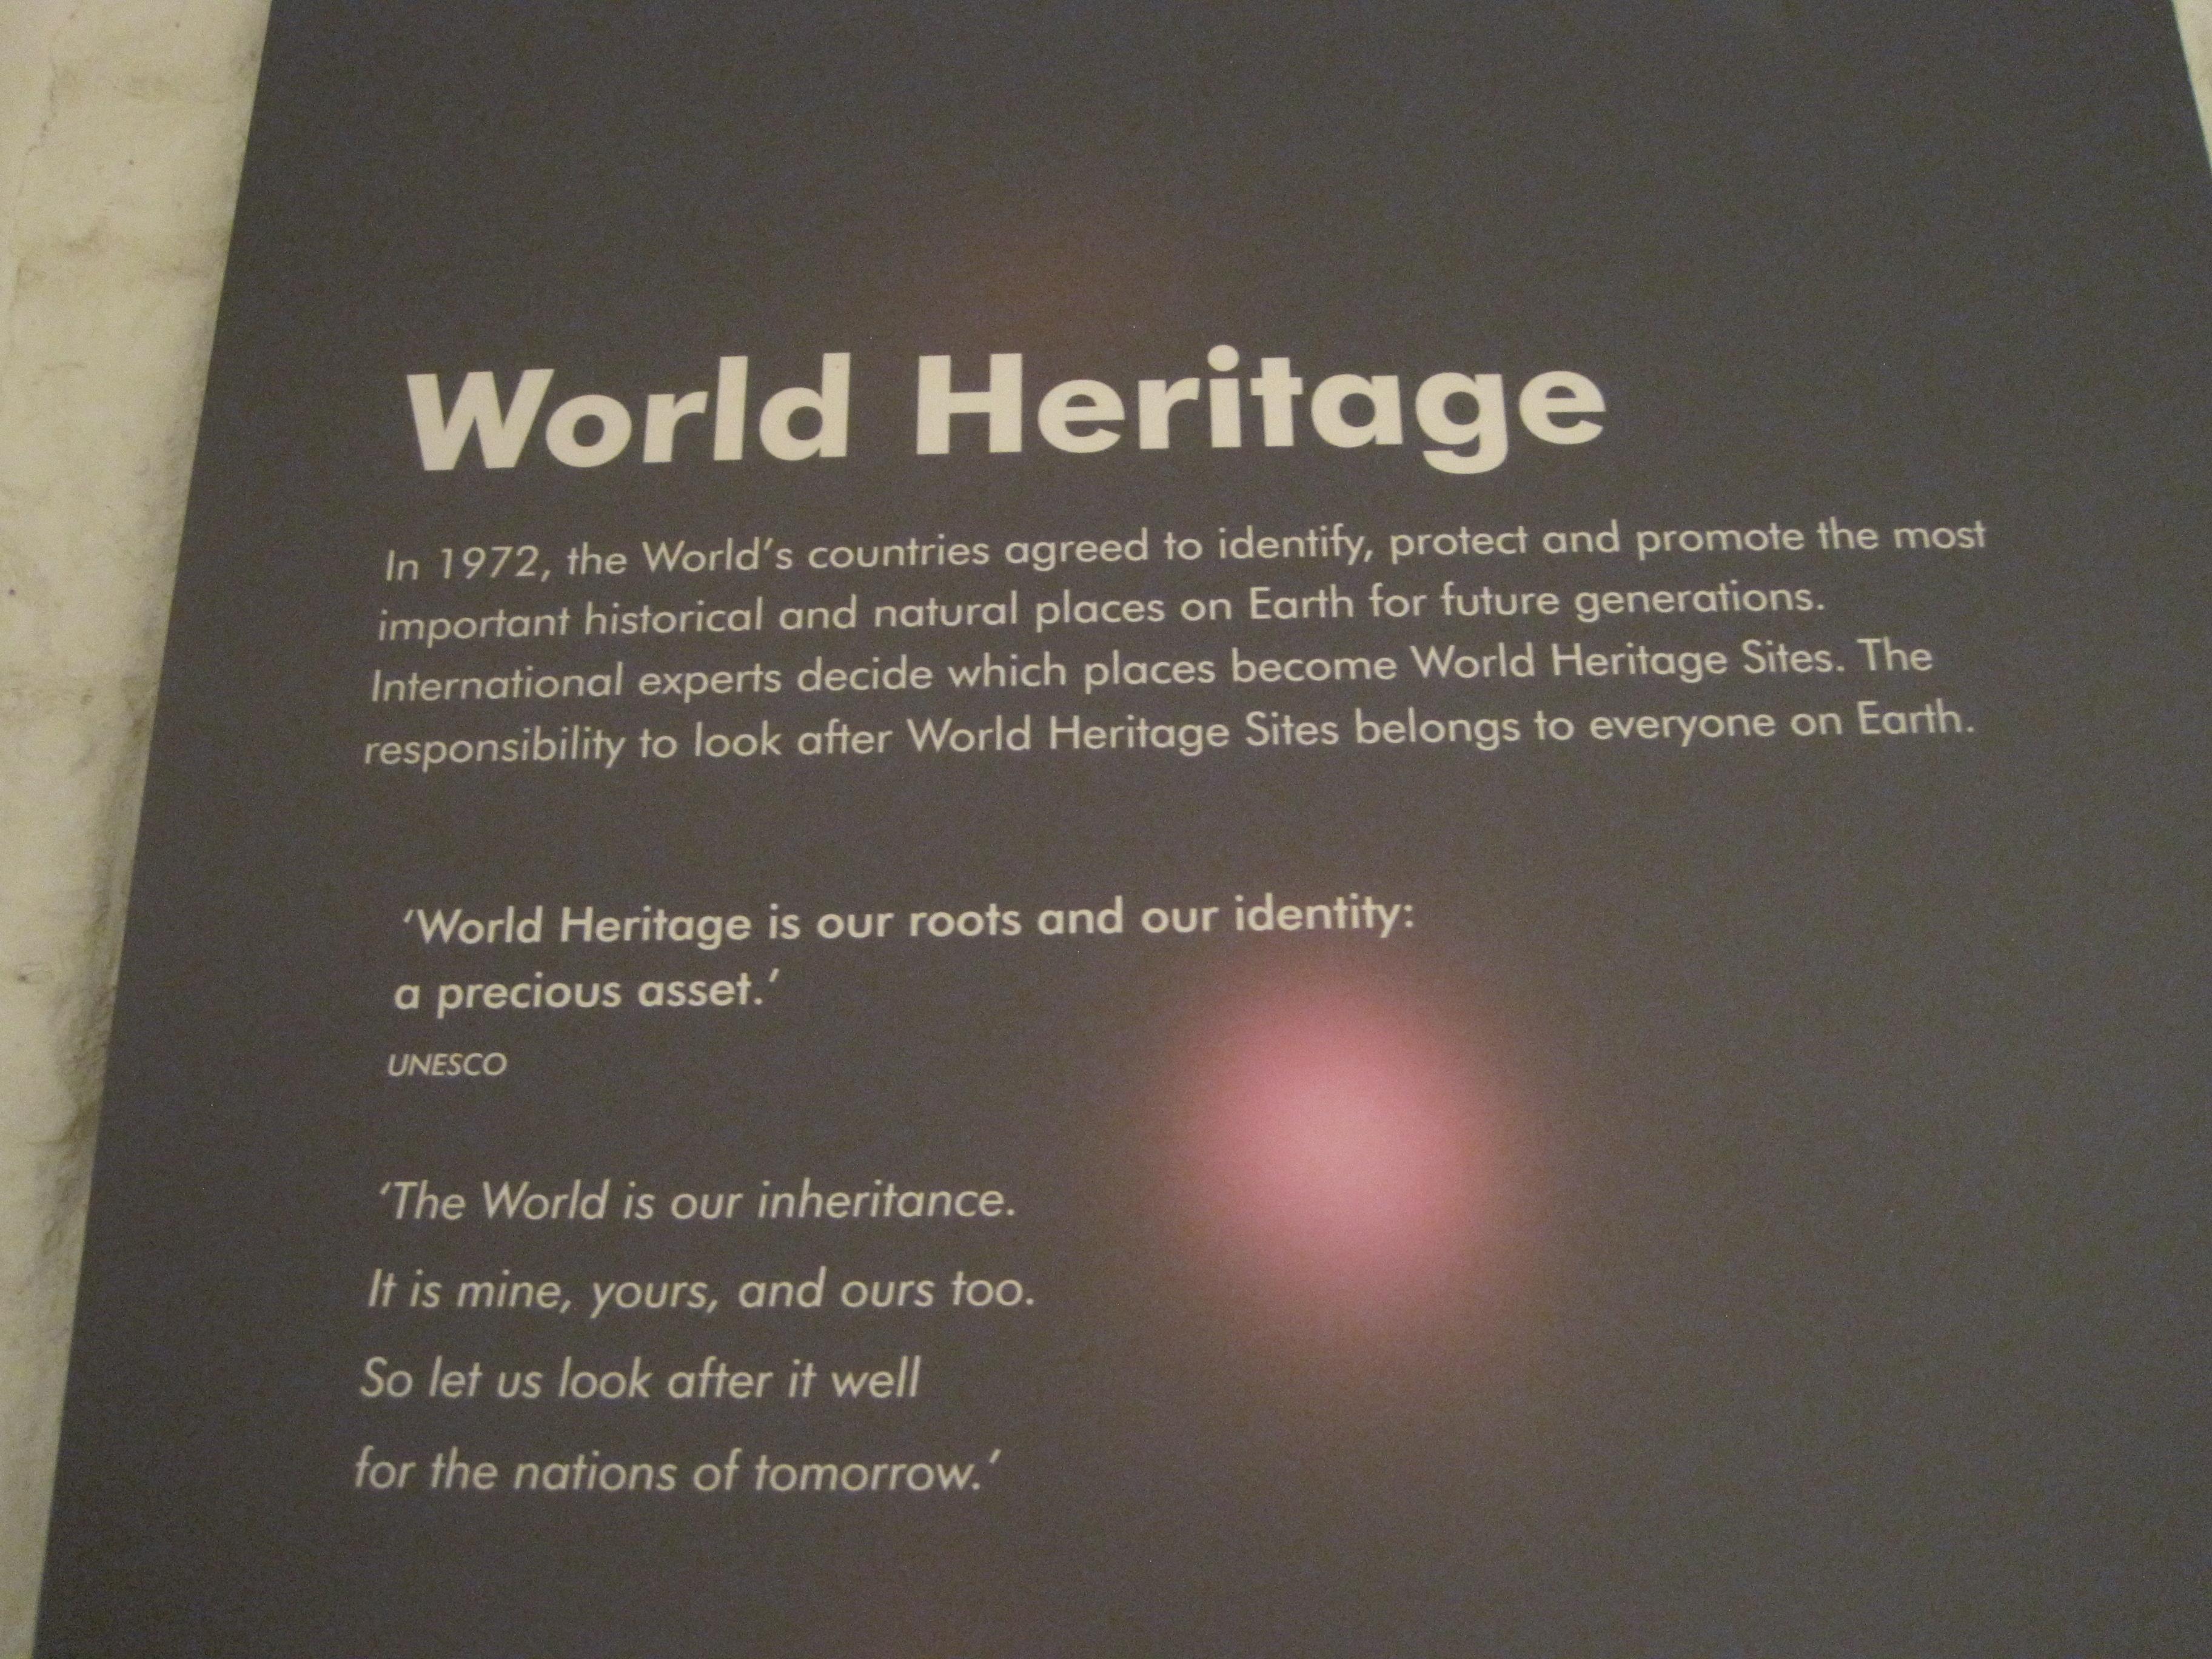 World heritage sign at Blaenavon Industrial Landscape - photo by juliamaud